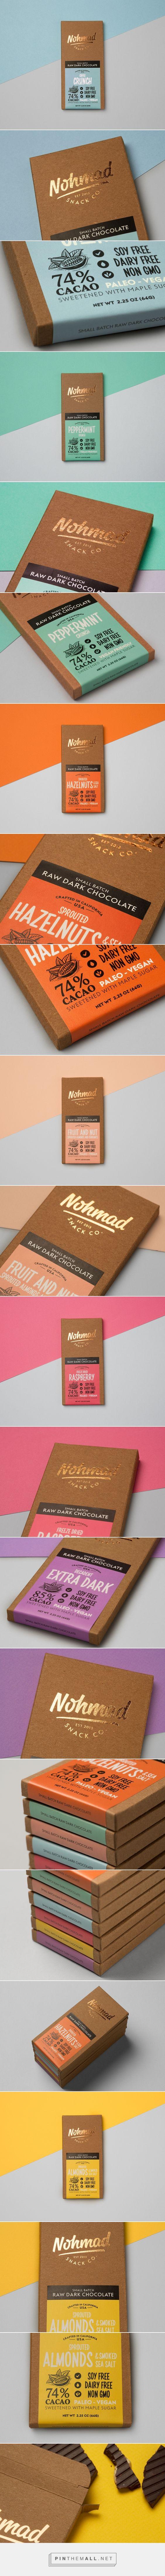 Packaging cioccolato avana